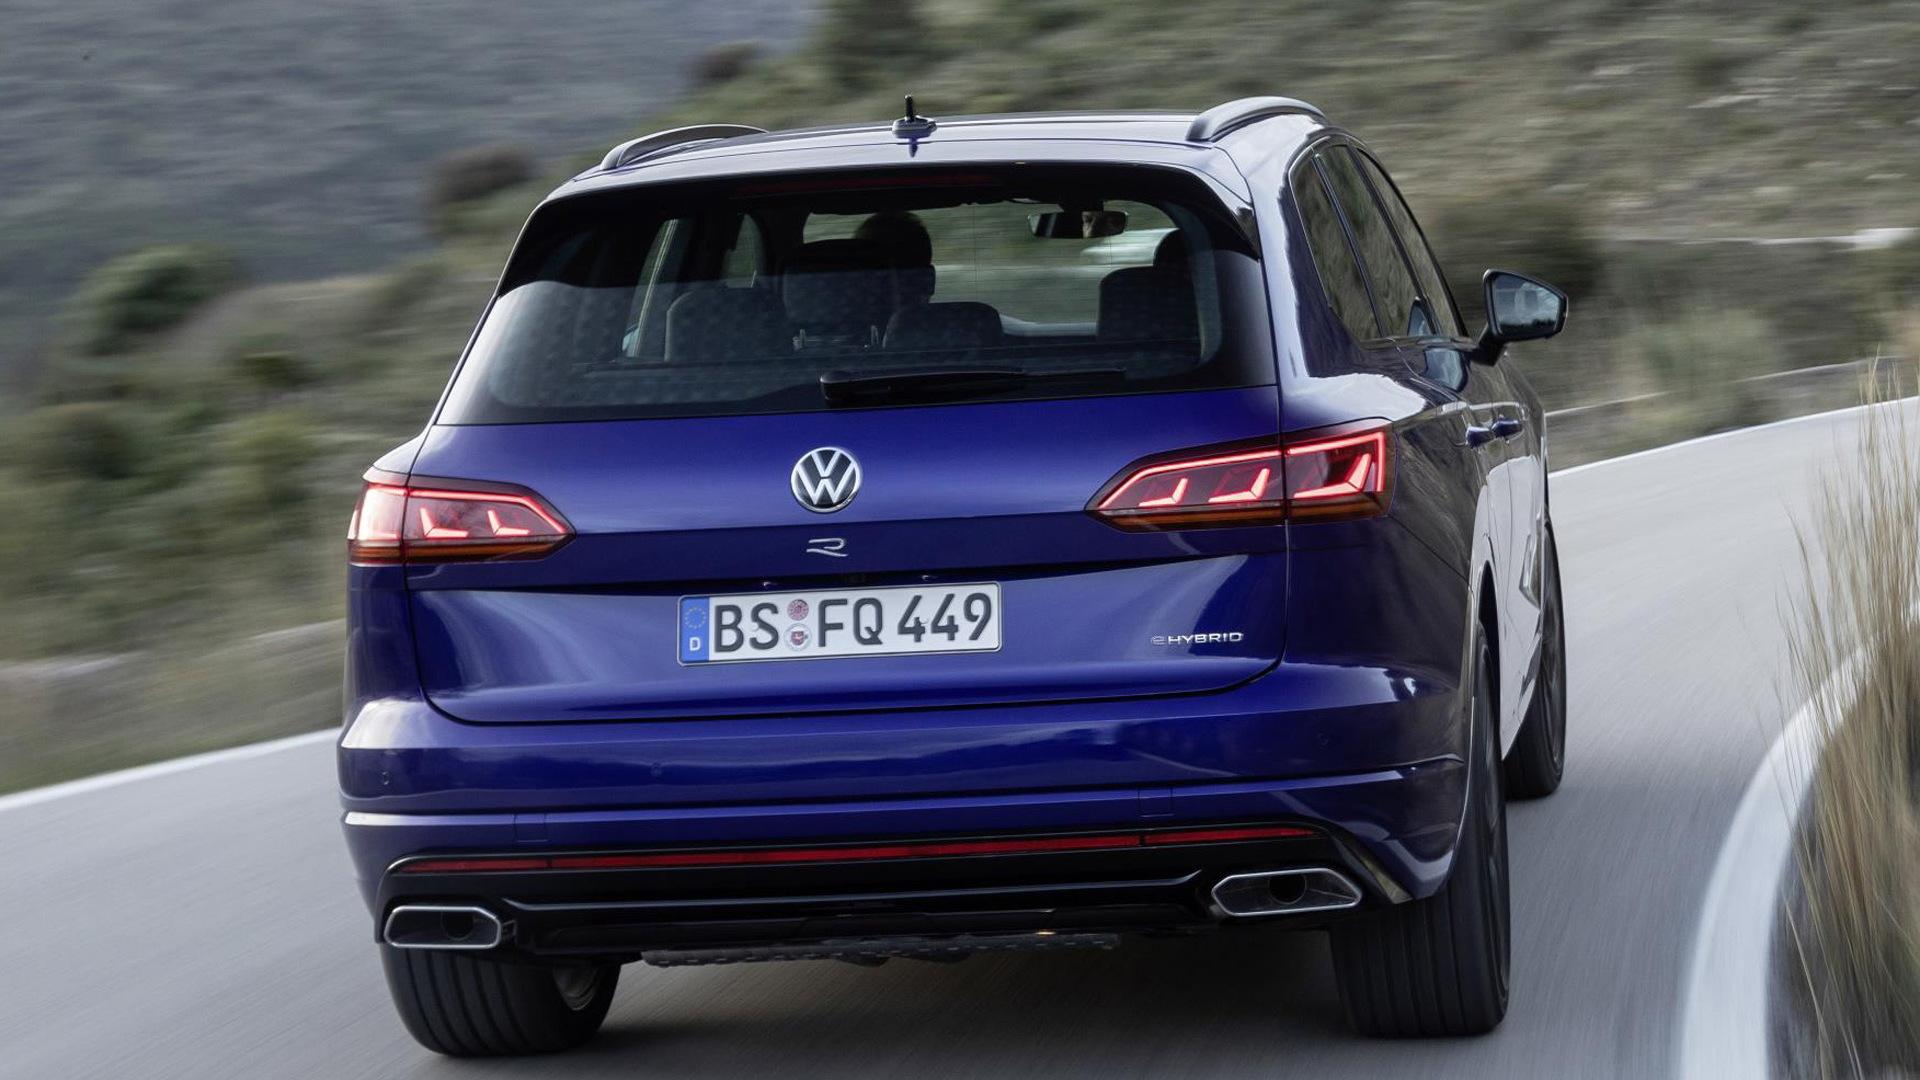 2020 Volkswagen Touareg R